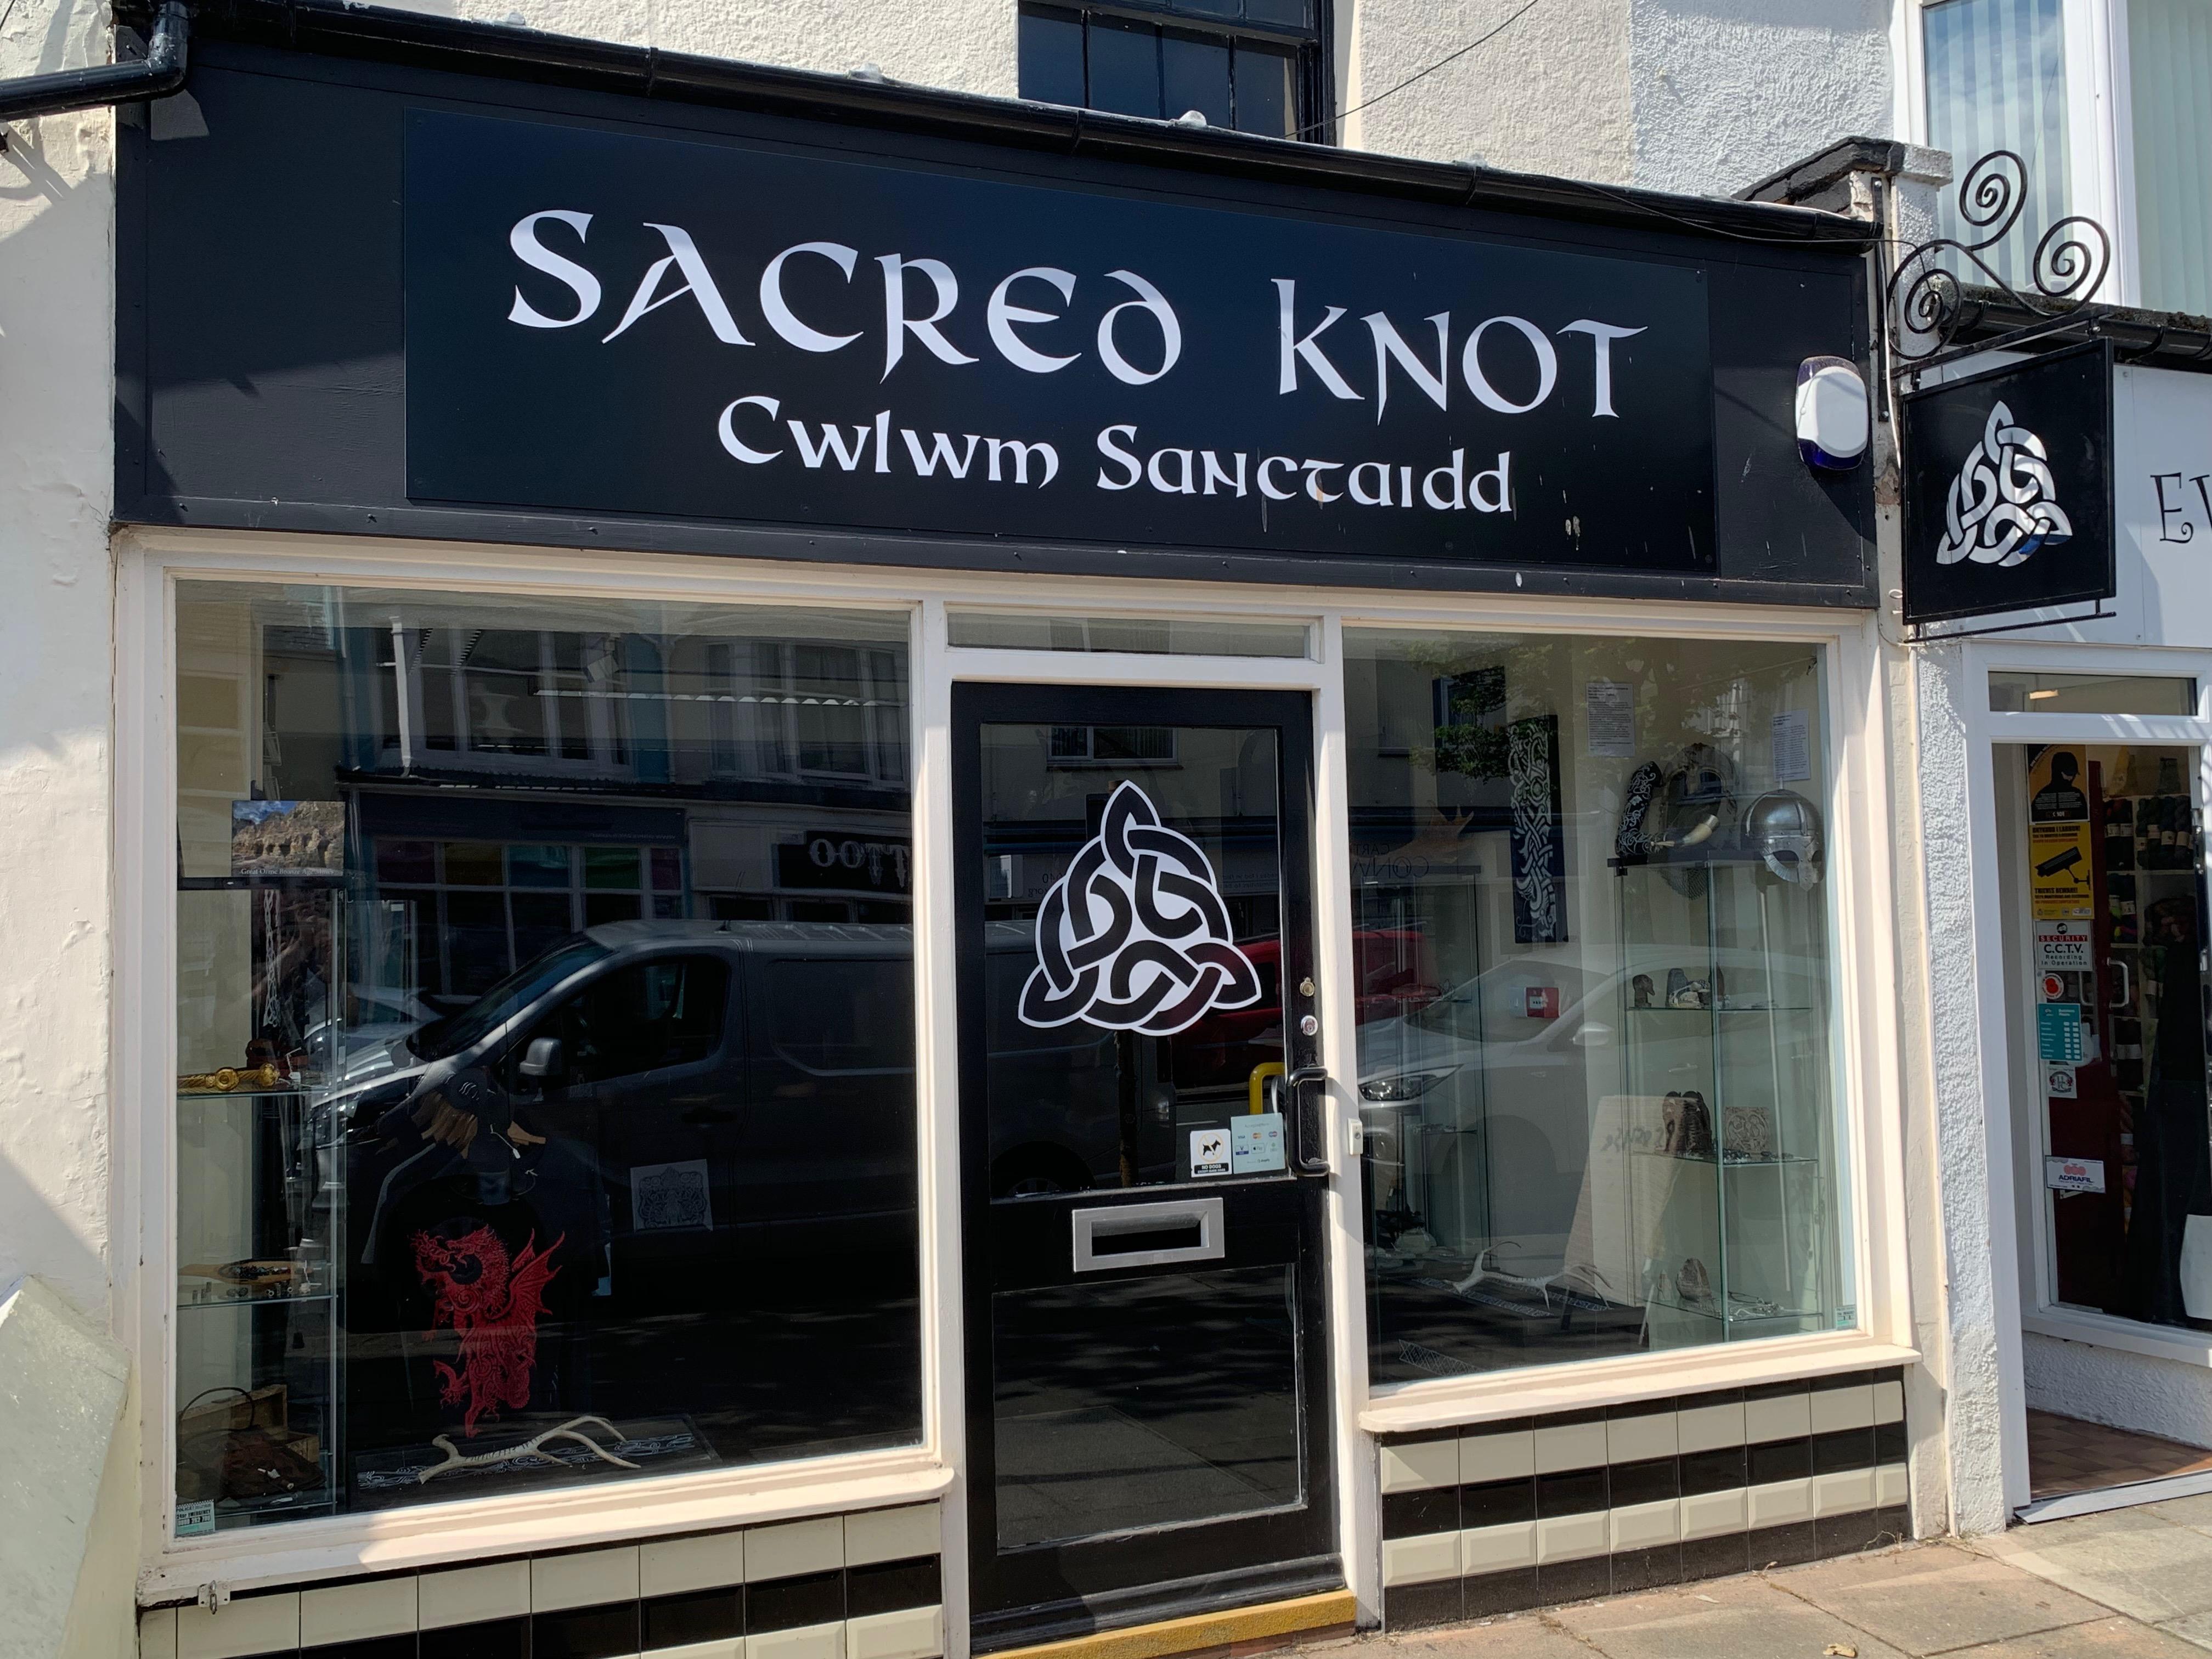 Sacred Knot Tattoo llandudno, Wales